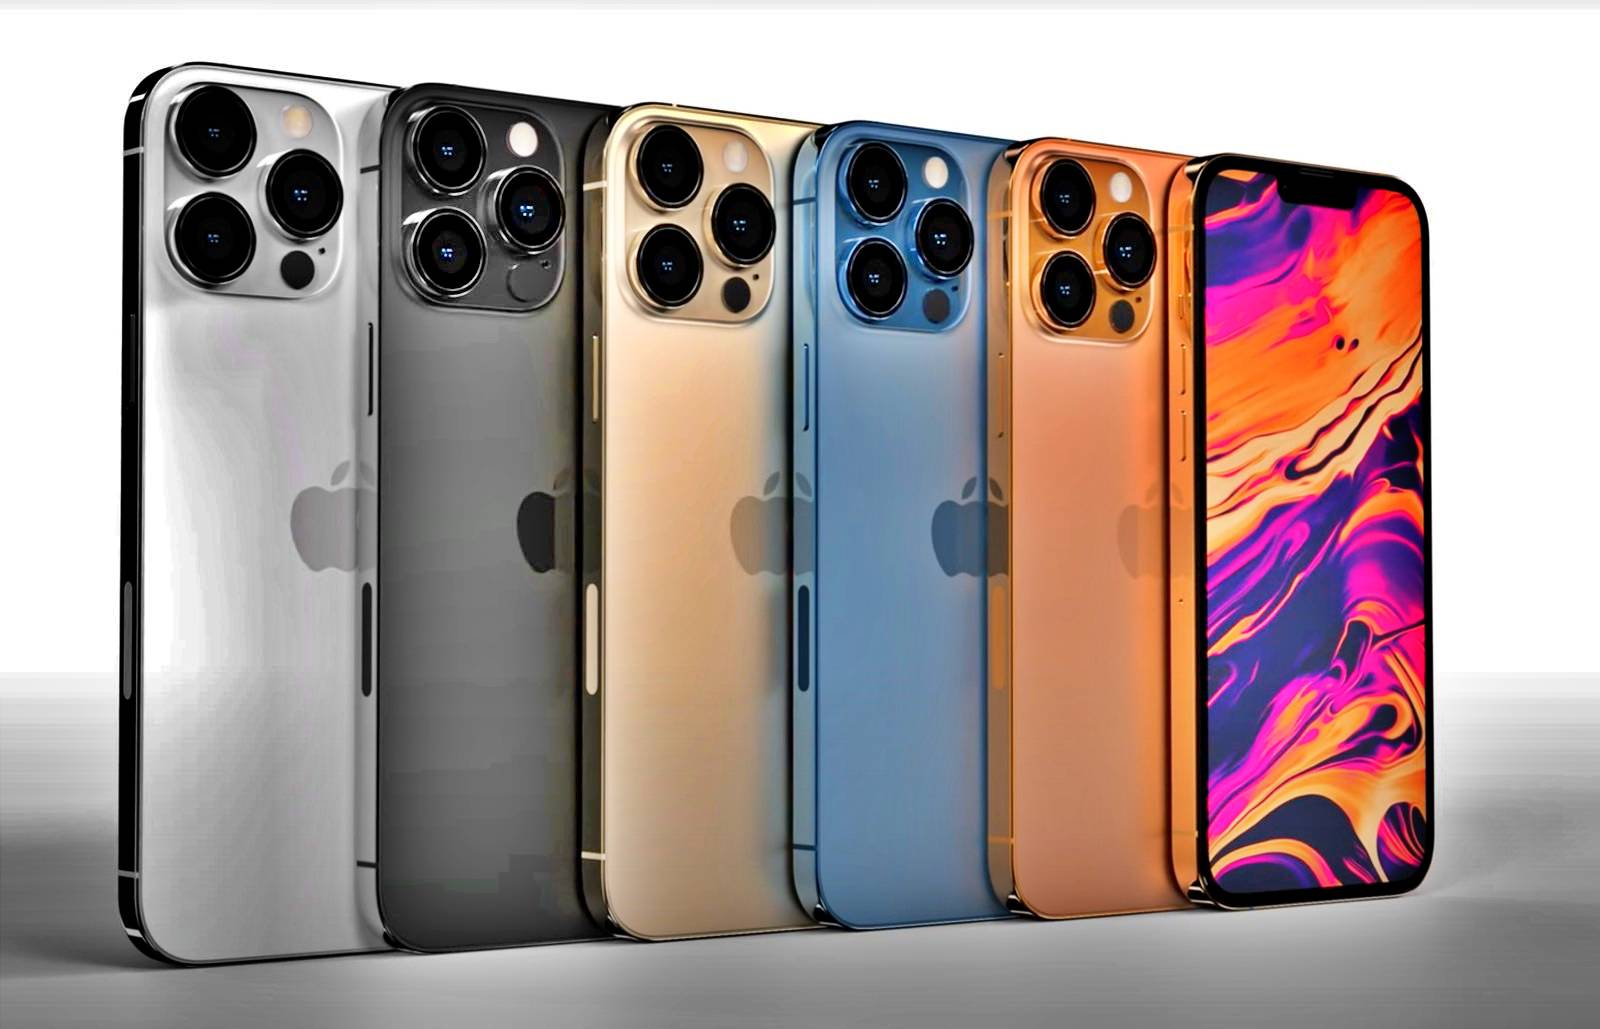 iPhone 13 Cand se Lanseaza Preturile Modele